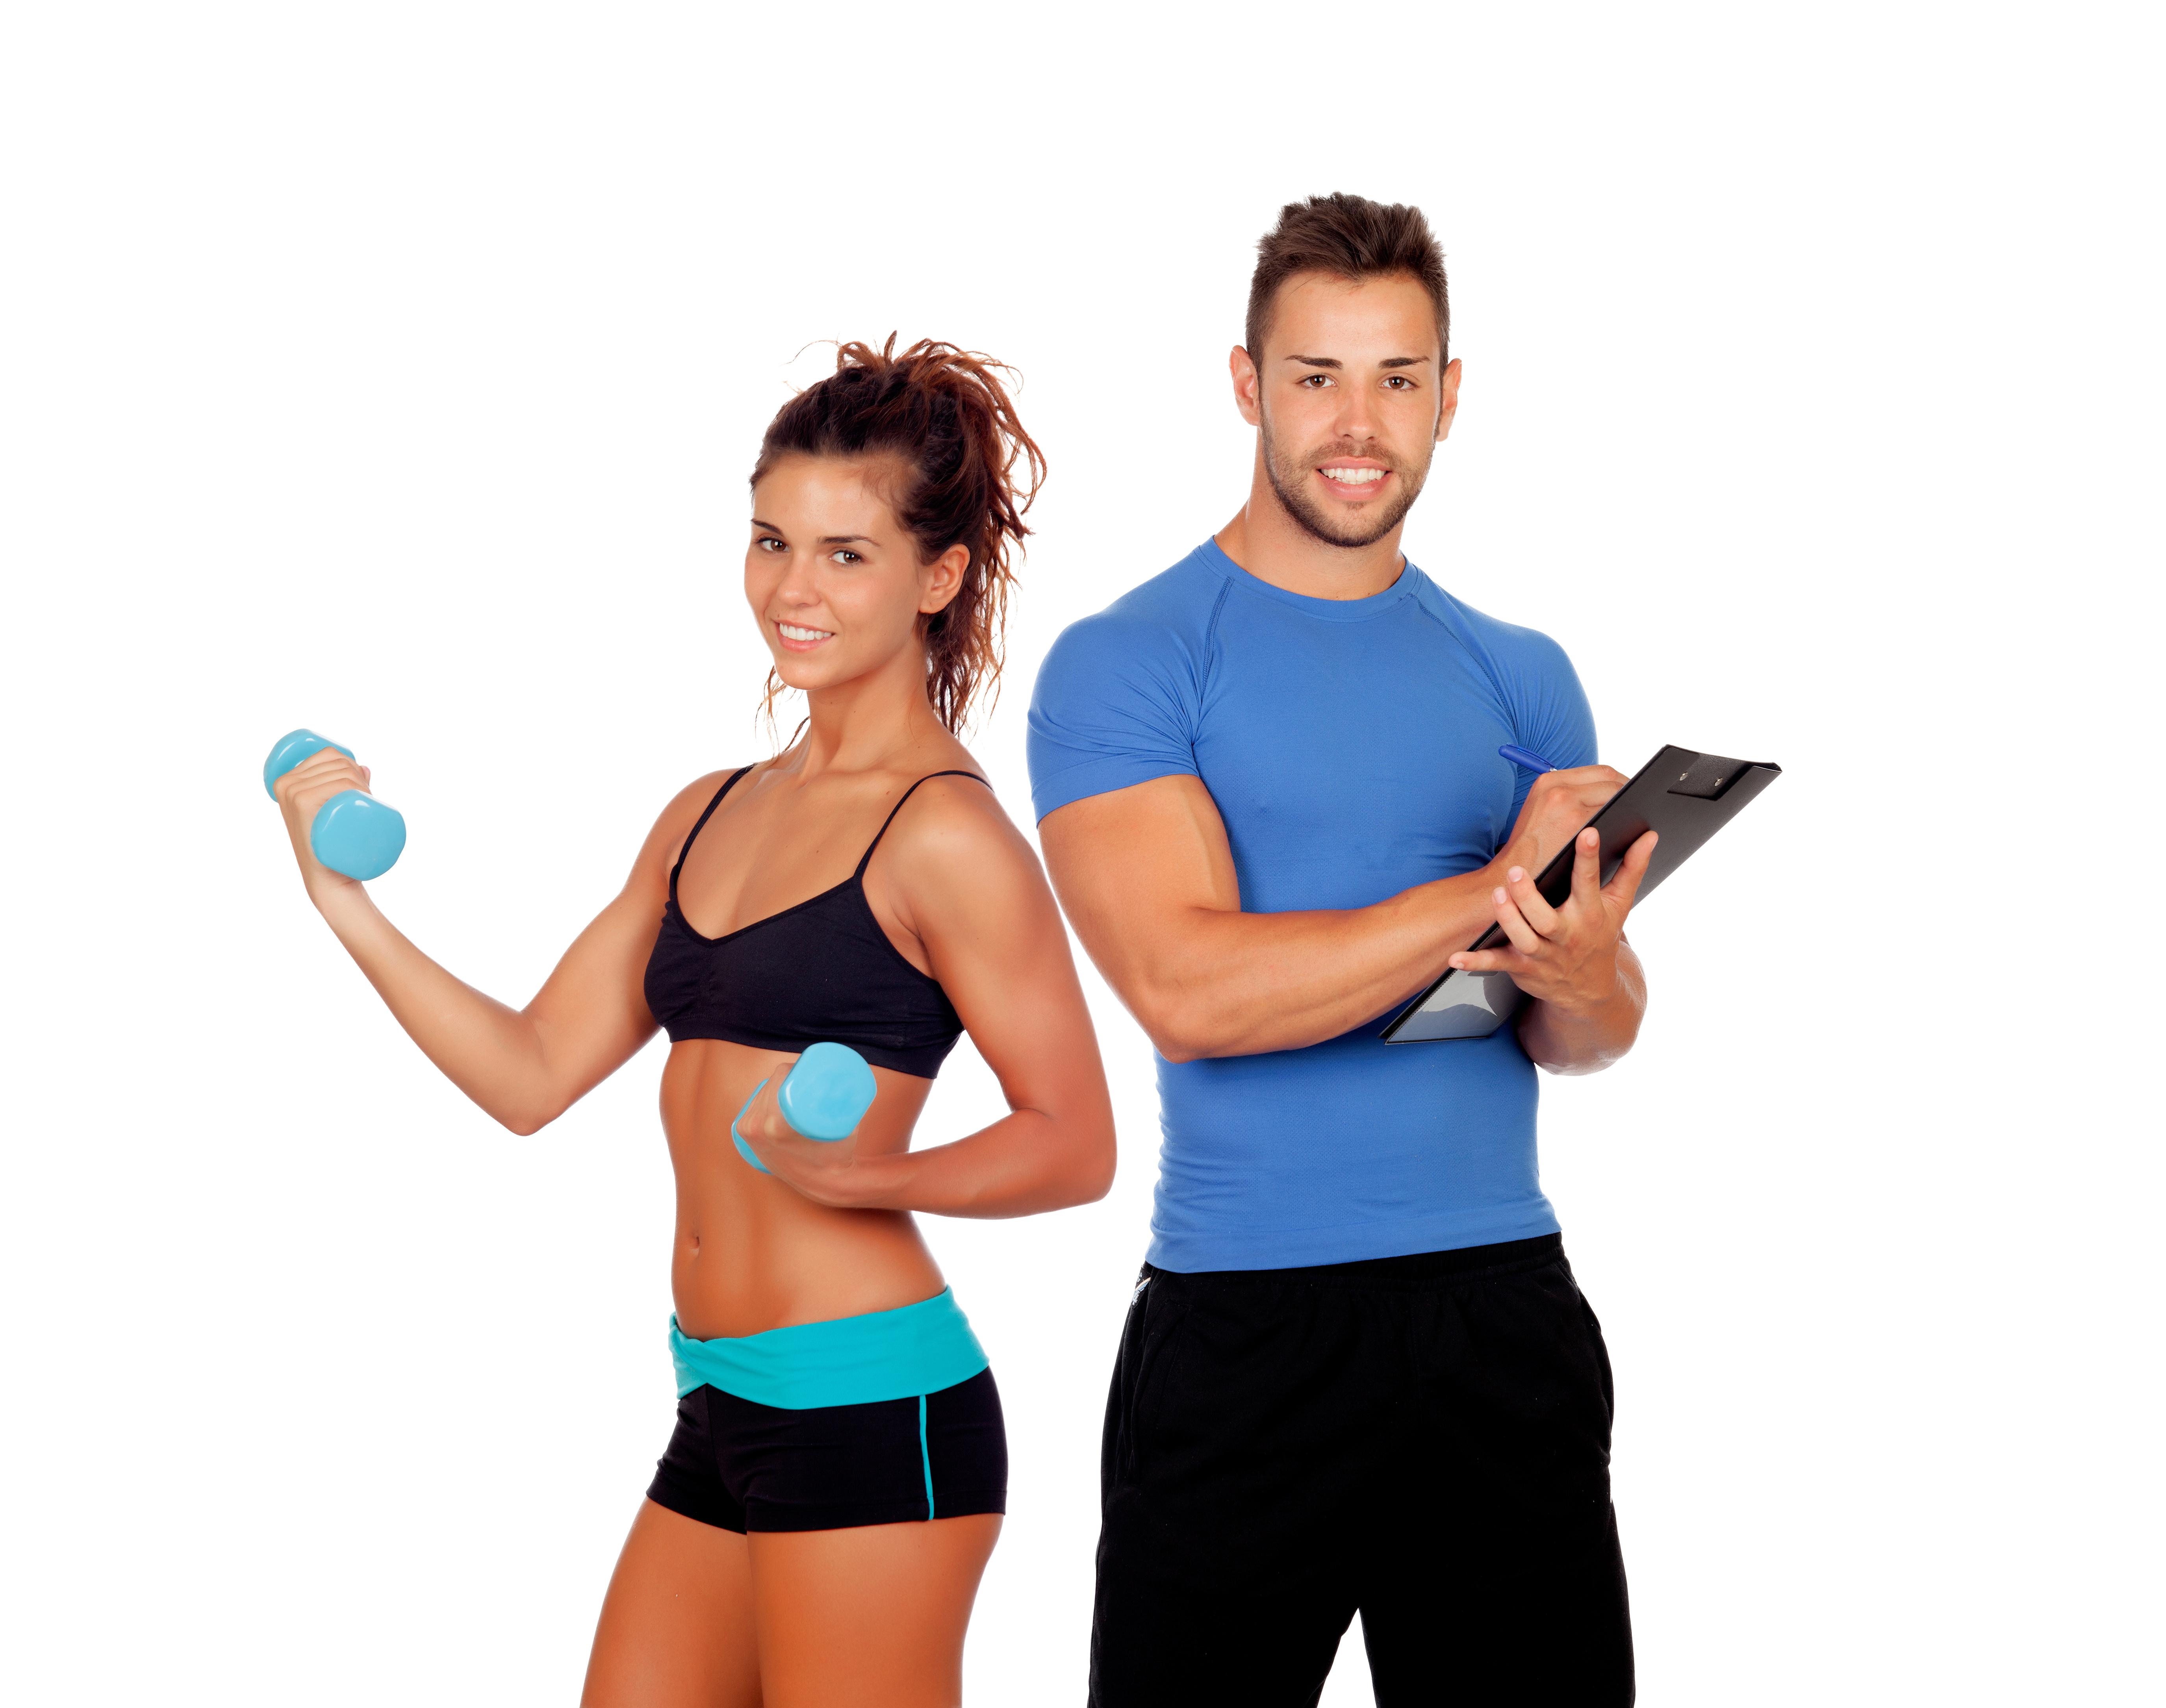 doelgroepen in de fitness